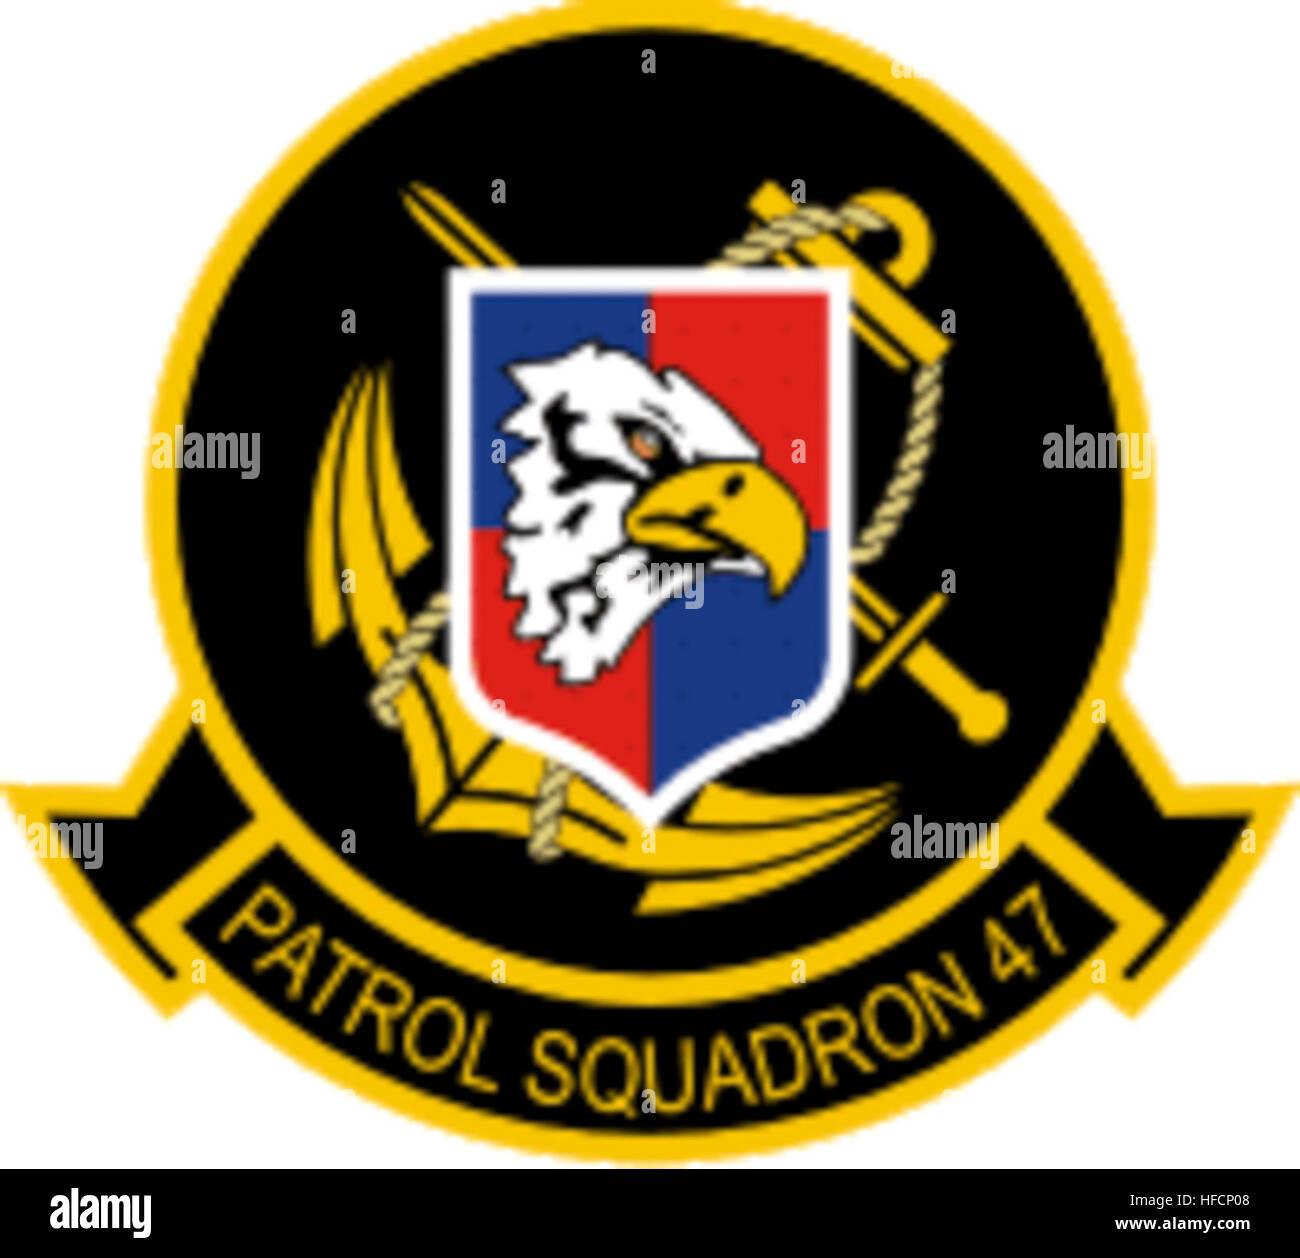 Patrol squadron 47 us navy insignia 1964 stock photo royalty patrol squadron 47 us navy insignia 1964 biocorpaavc